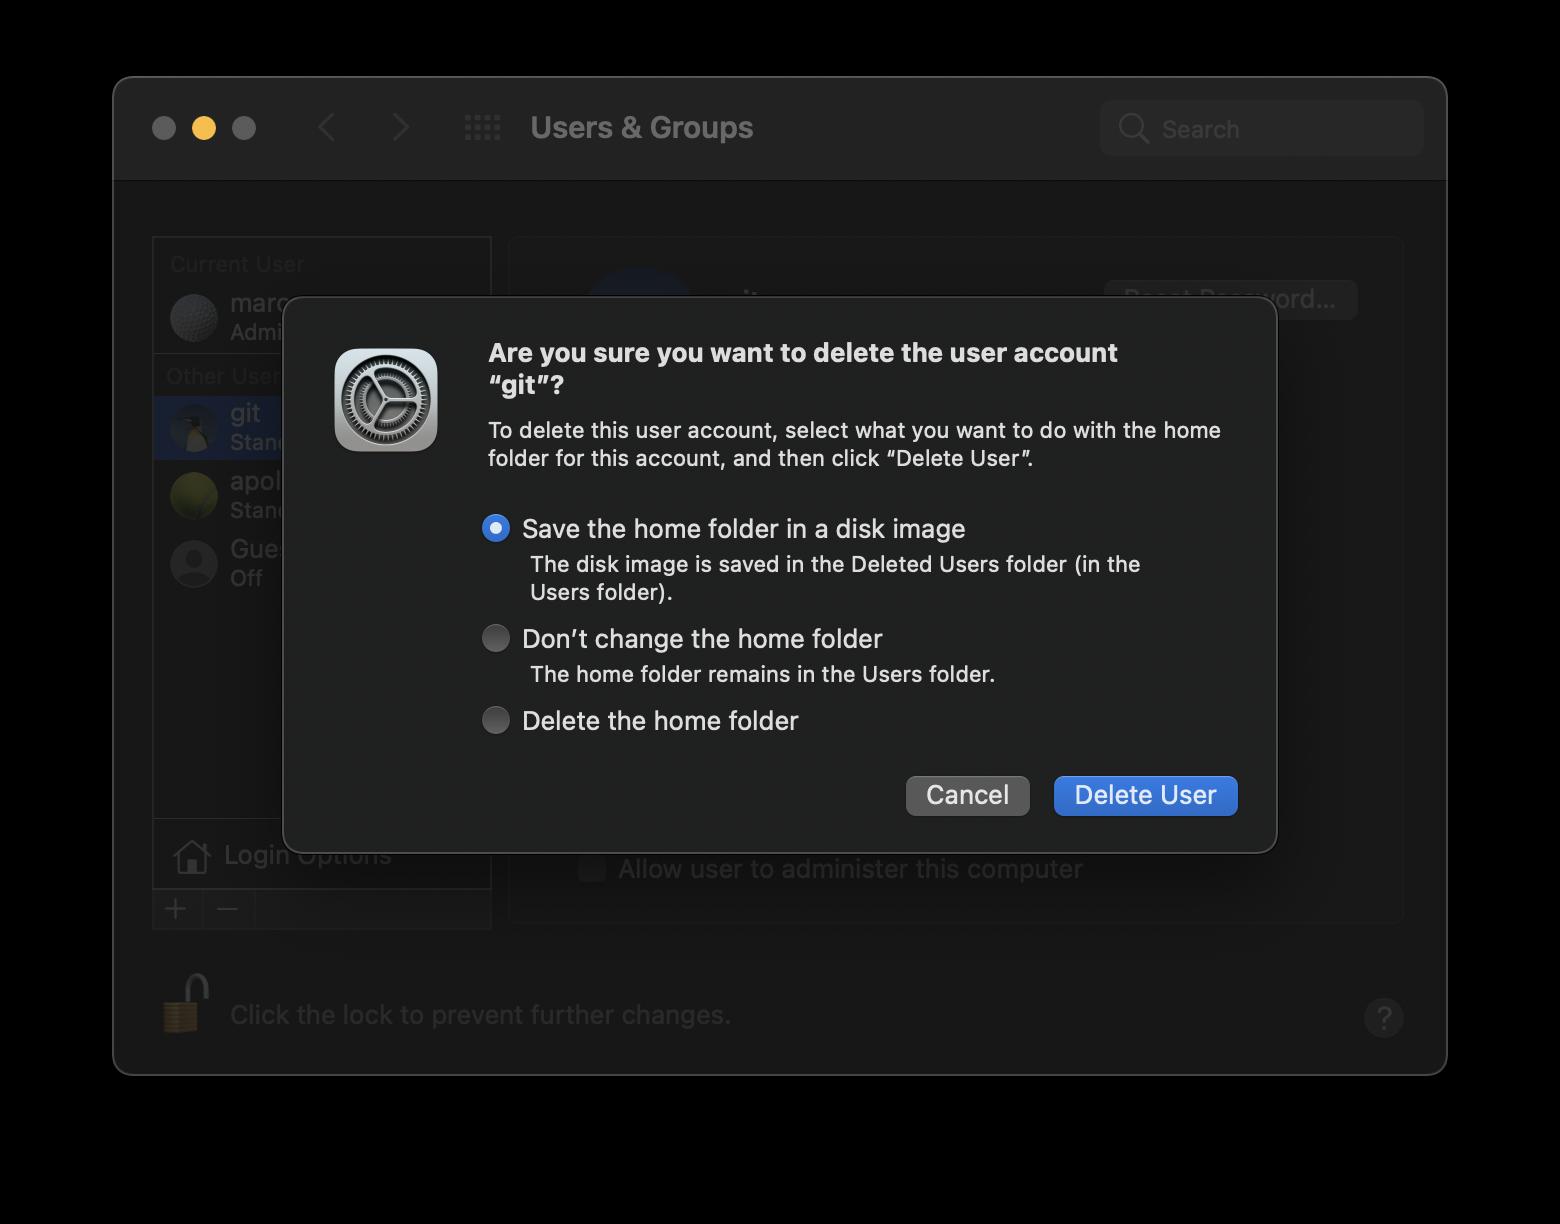 Come cancellare un utente su macOS